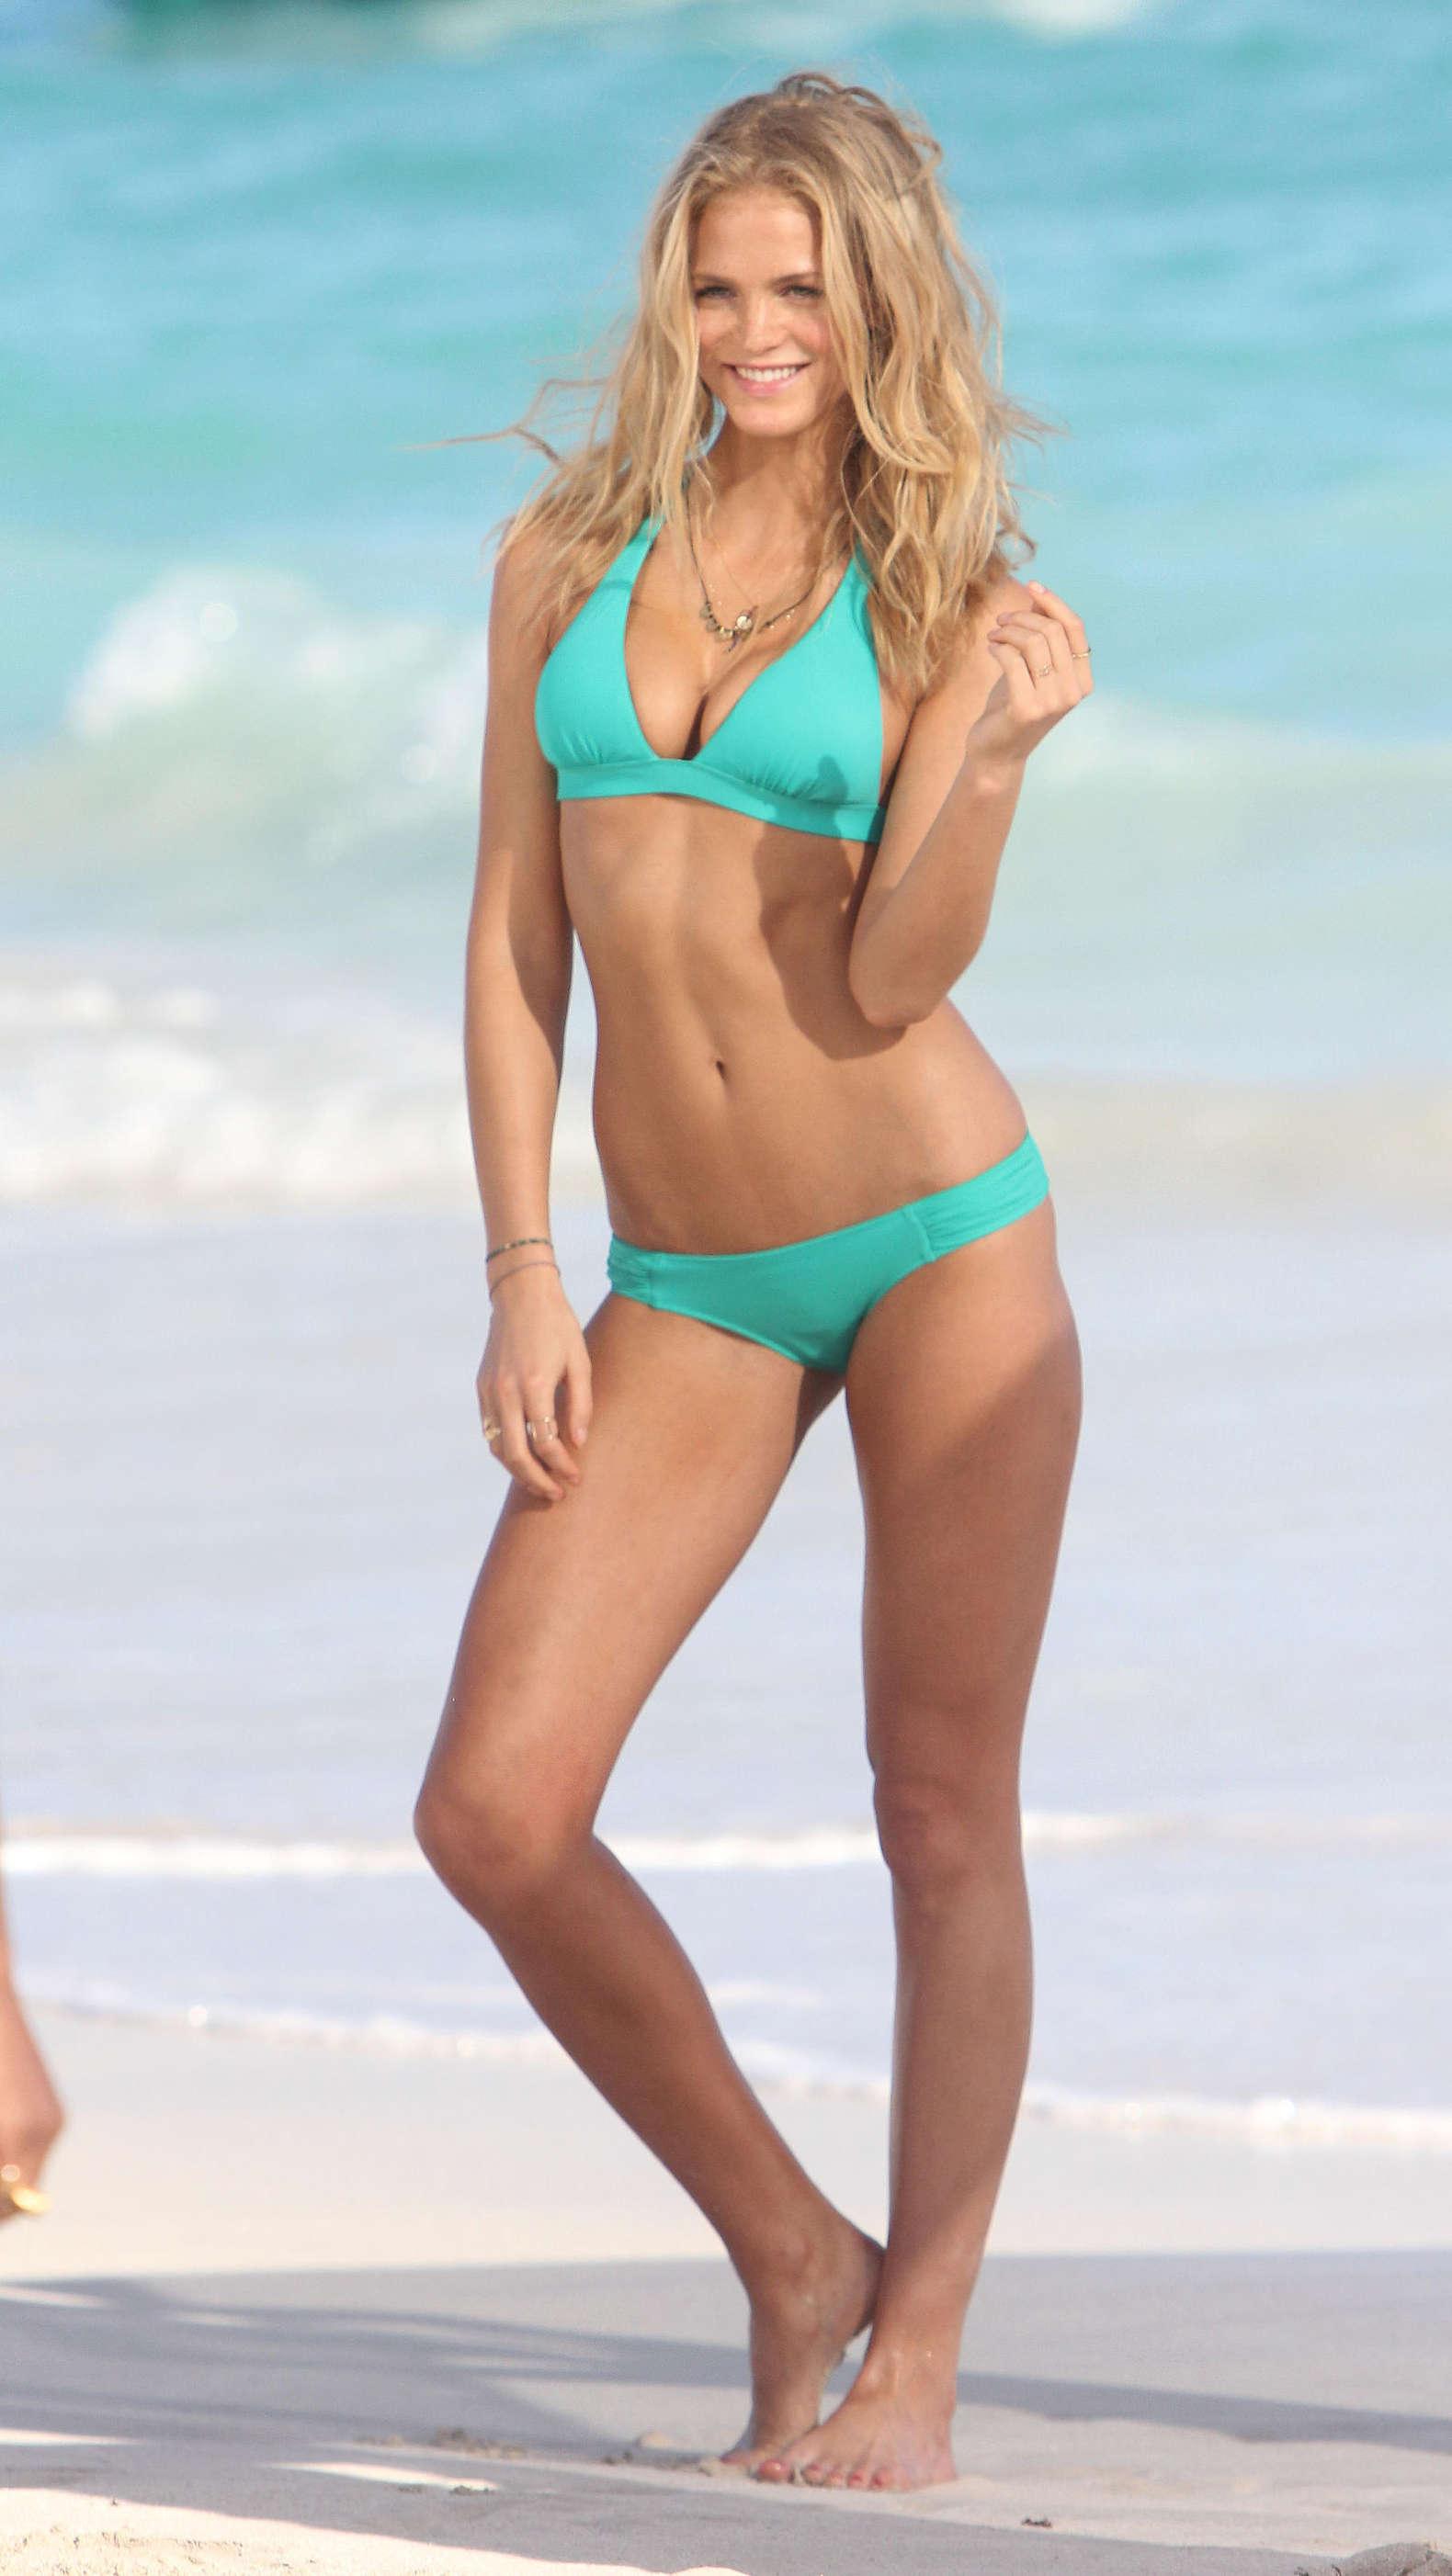 Erin Heatherton - VS 2013 bikini photoshoot in St Barts-02